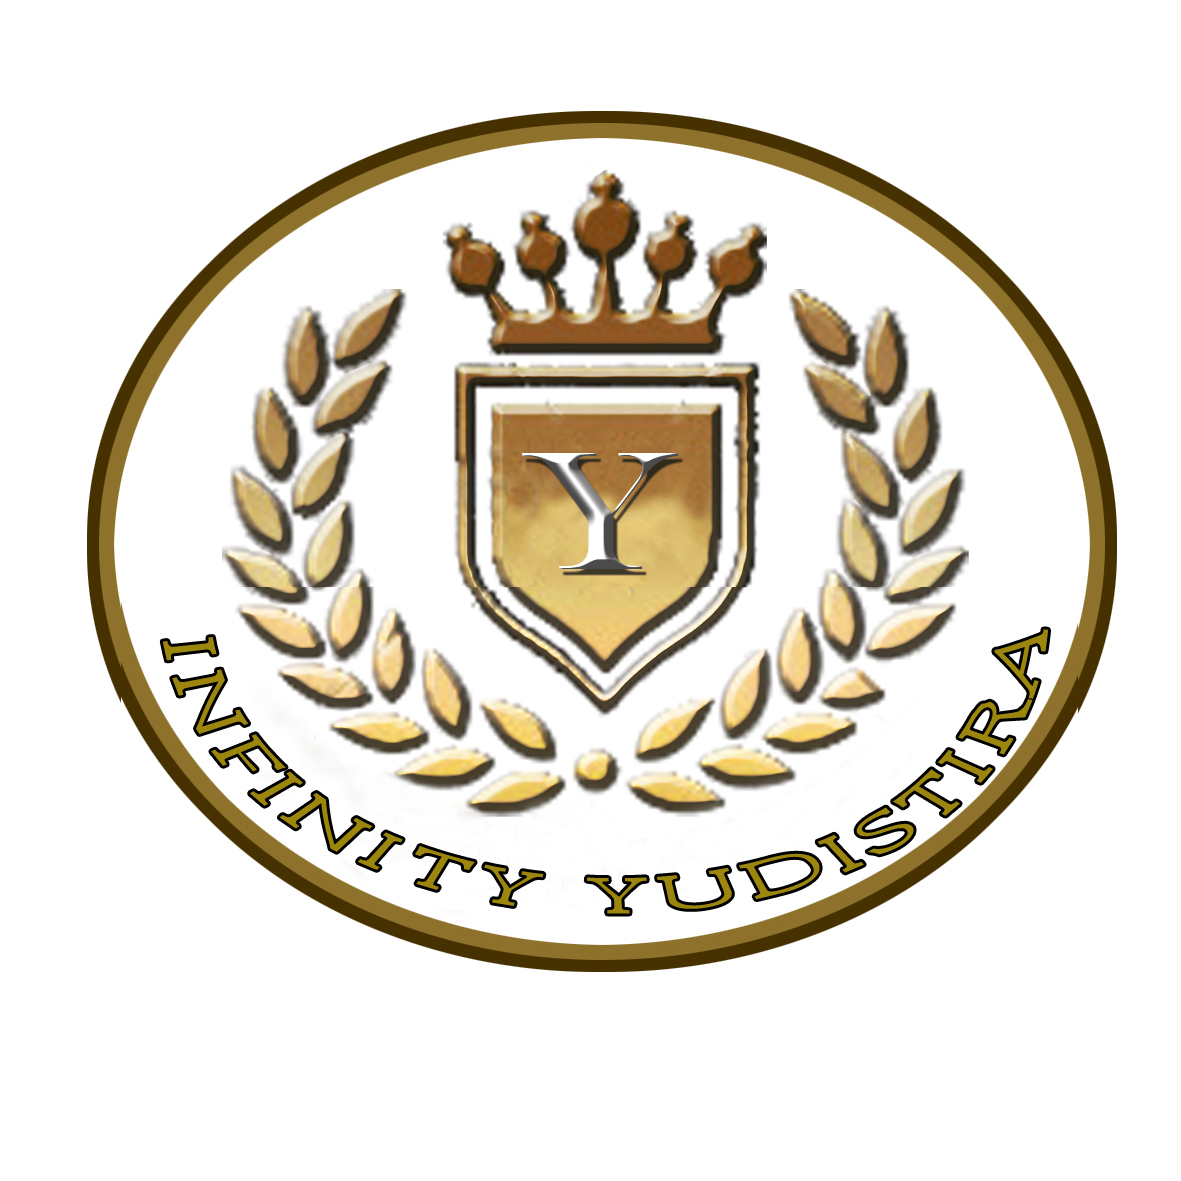 Lowongan Kerja PT. INFINITY YUDISTIRA INDONESIA PROPERTY